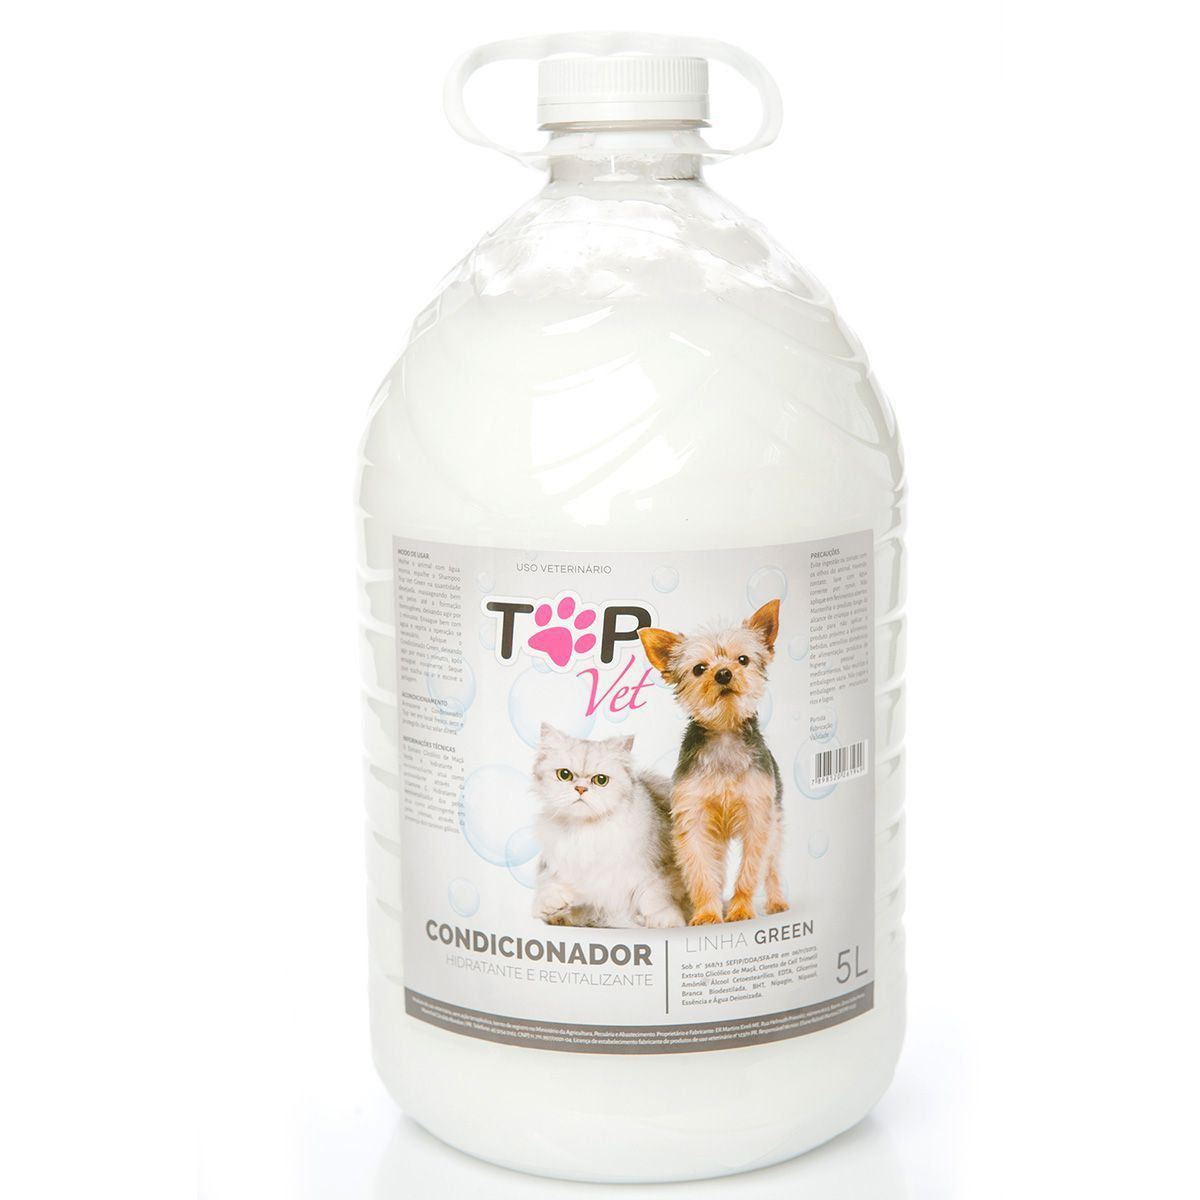 Kit Shampoo Neutro Uva e Condicionador Green Top Vet